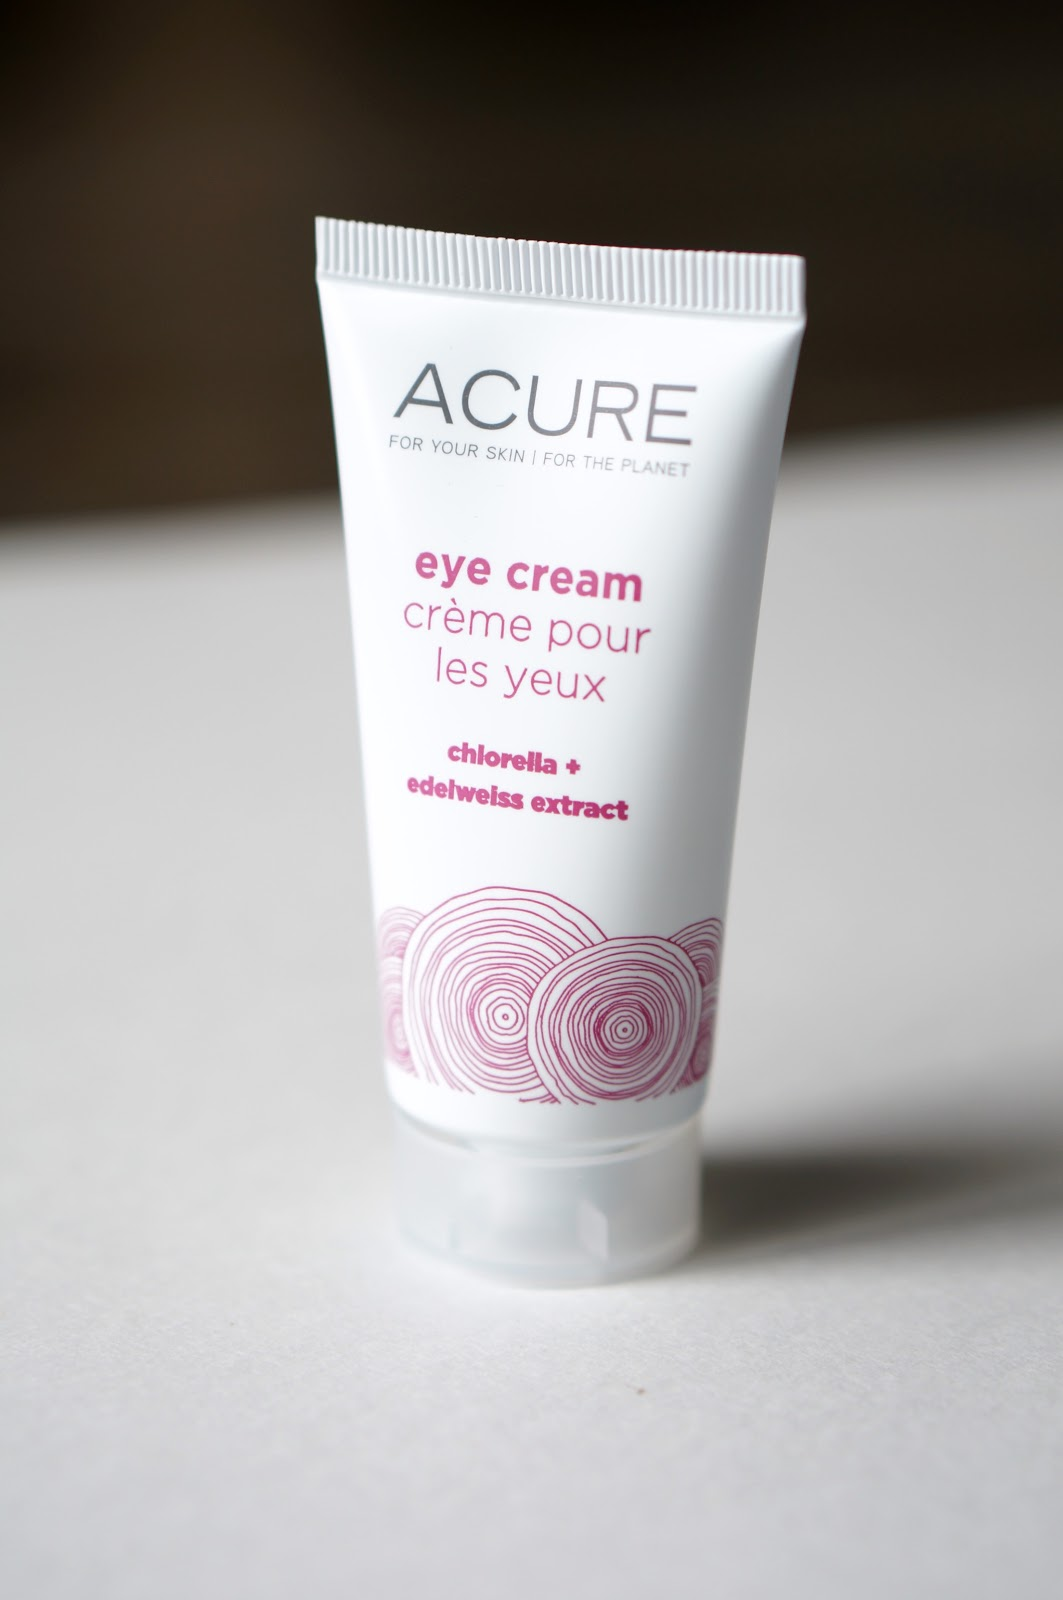 Rebecca Lately Drugstore Eye Cream Reviews Burt's Bees Eye Cream Acure Eye Cream Say Yes to Burberries Eye Firming Treatment